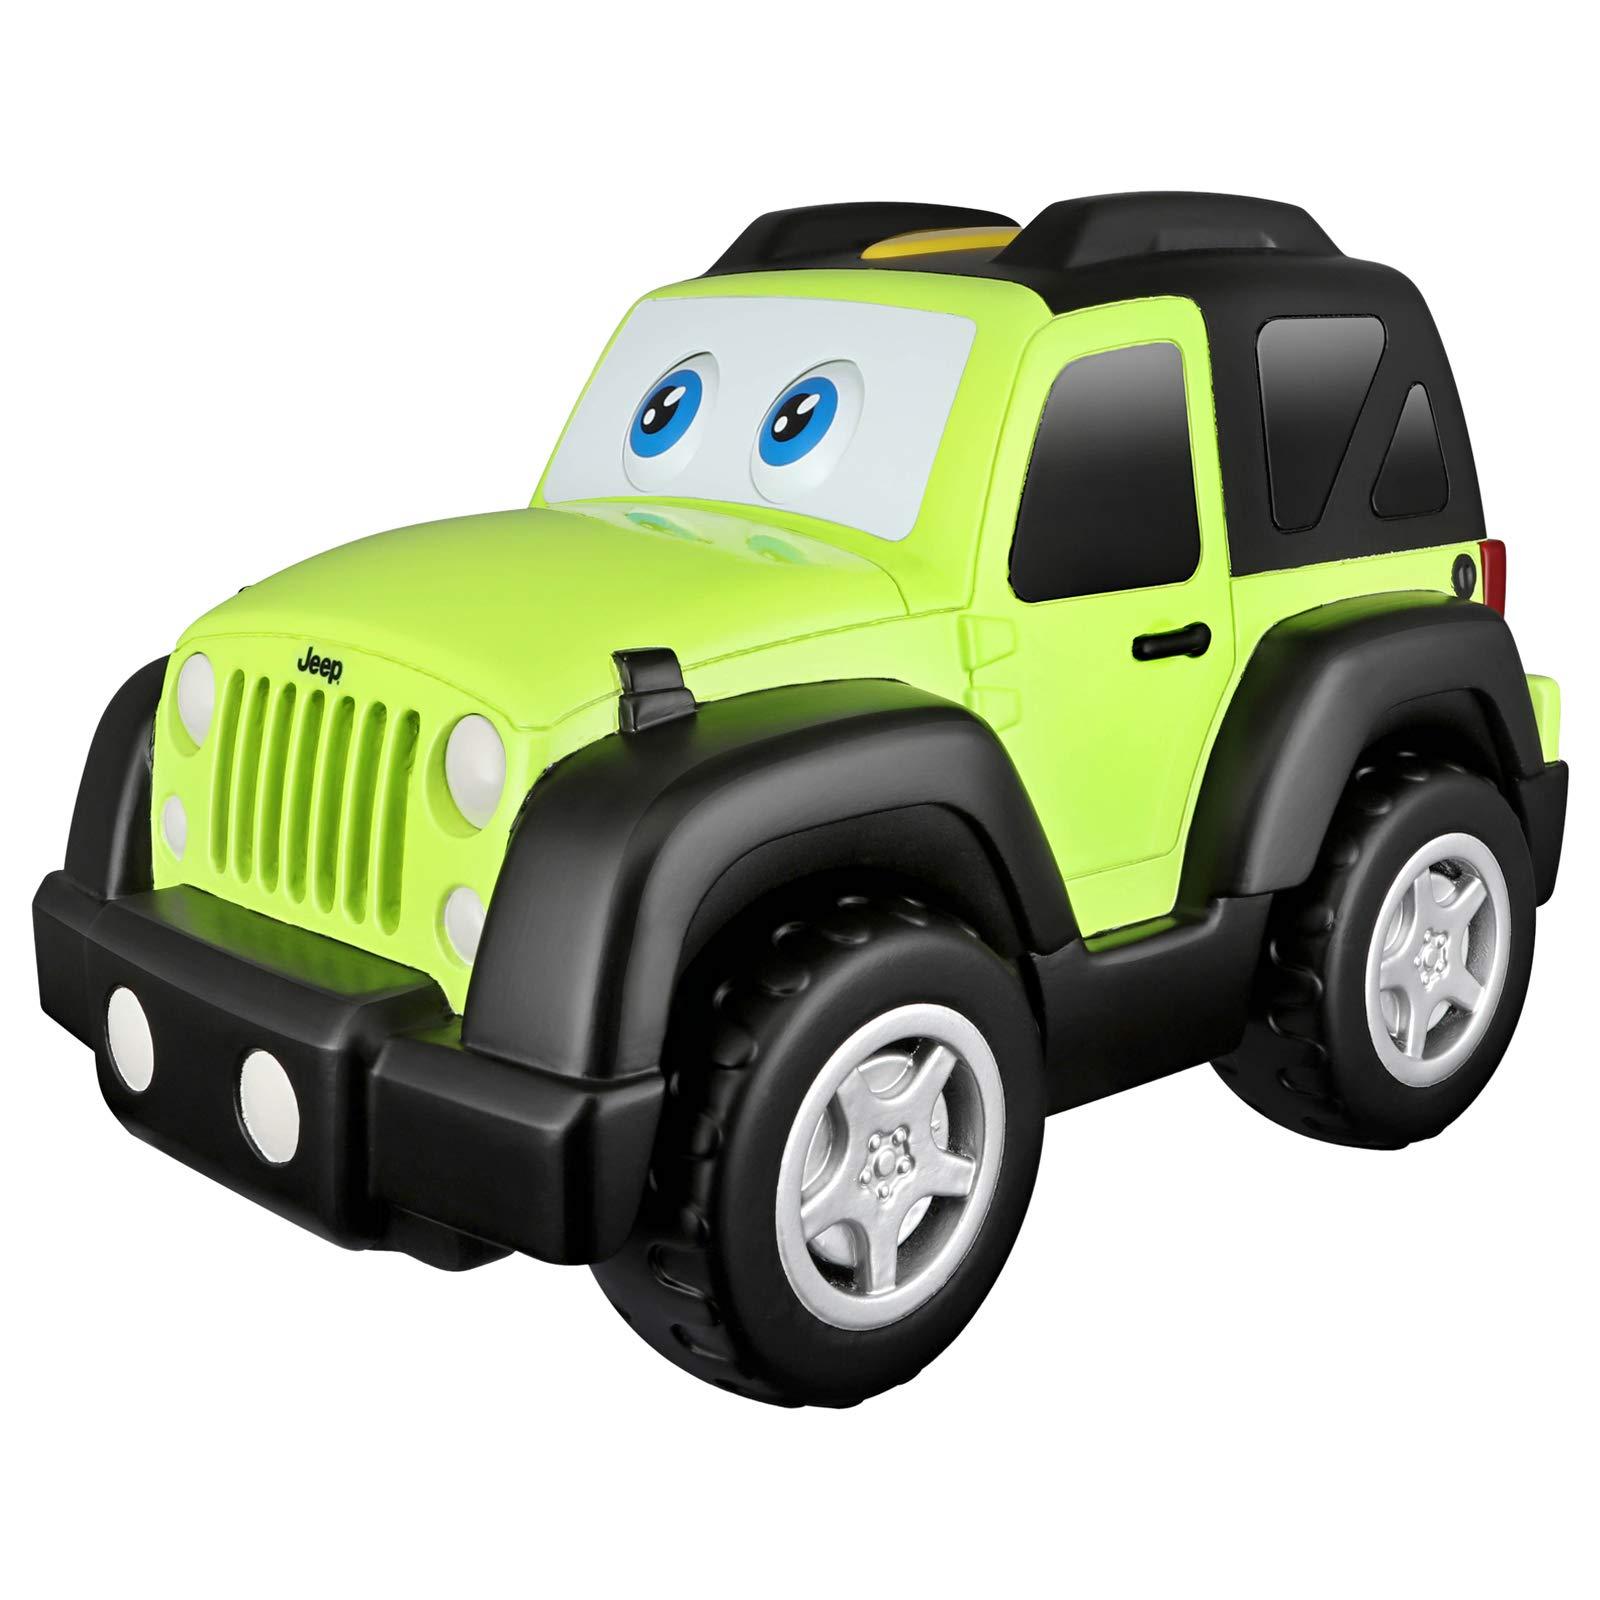 Buy Jeep Wrangler >> Jeep Wrangler Funny Friends Price In Uae Amazon Ae Toys